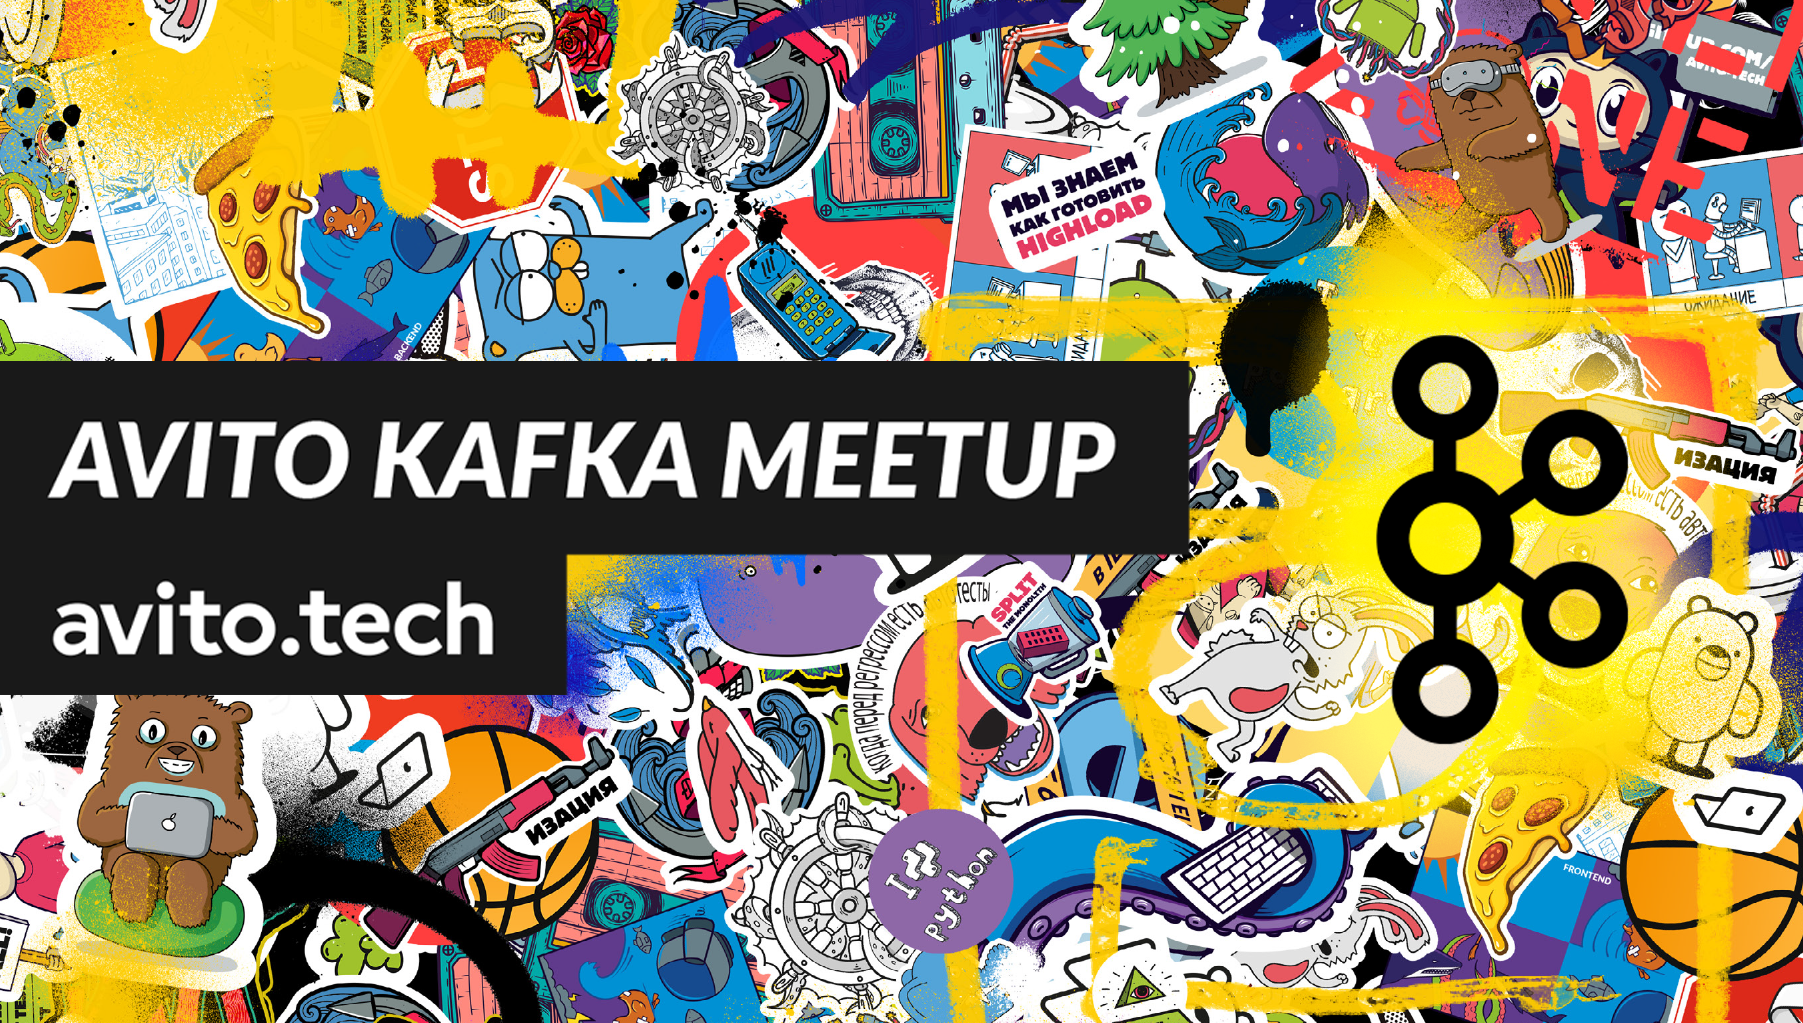 Avito Kafka Meetup